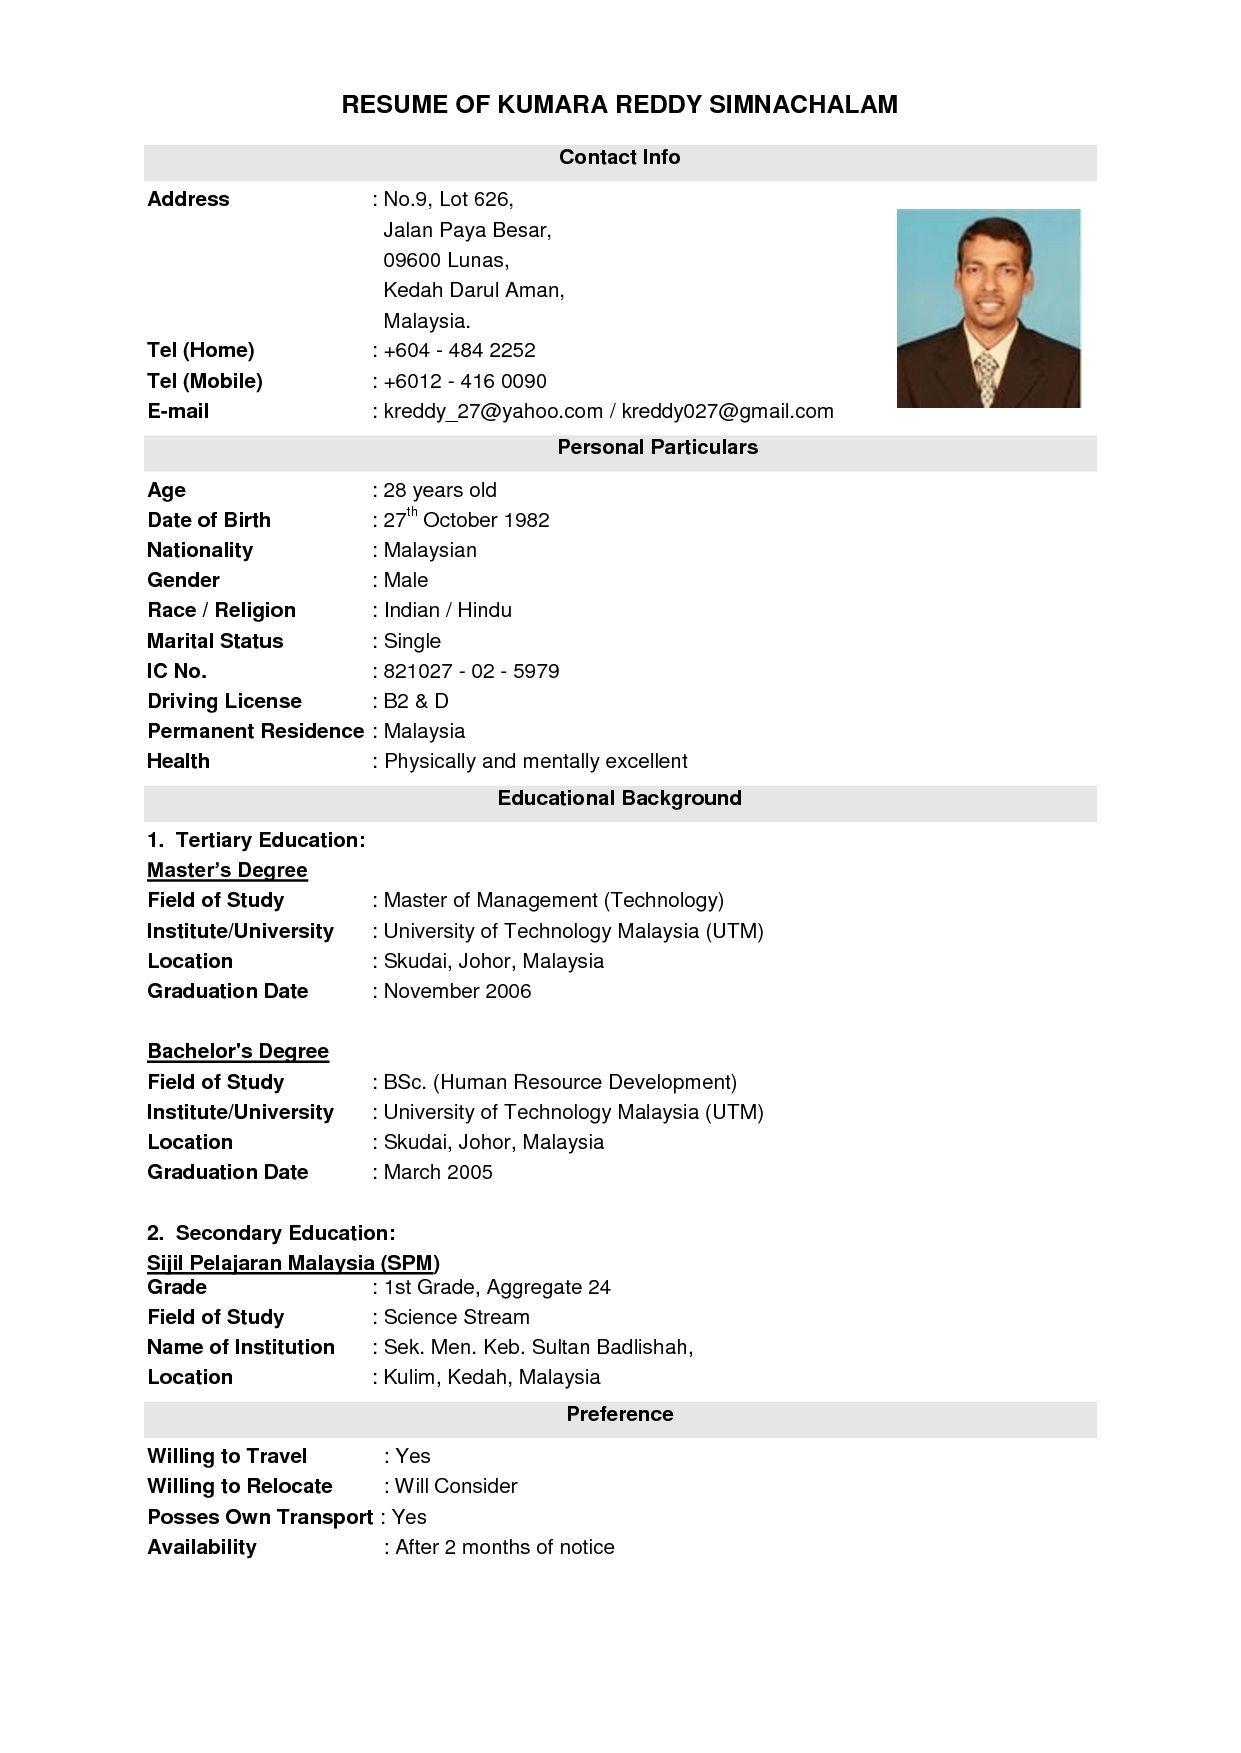 Resume Templates Jobstreet Jobstreet Resume Resumetemplates Templates Http Templatedocs N Simple Resume Format Sample Resume Format Best Resume Template